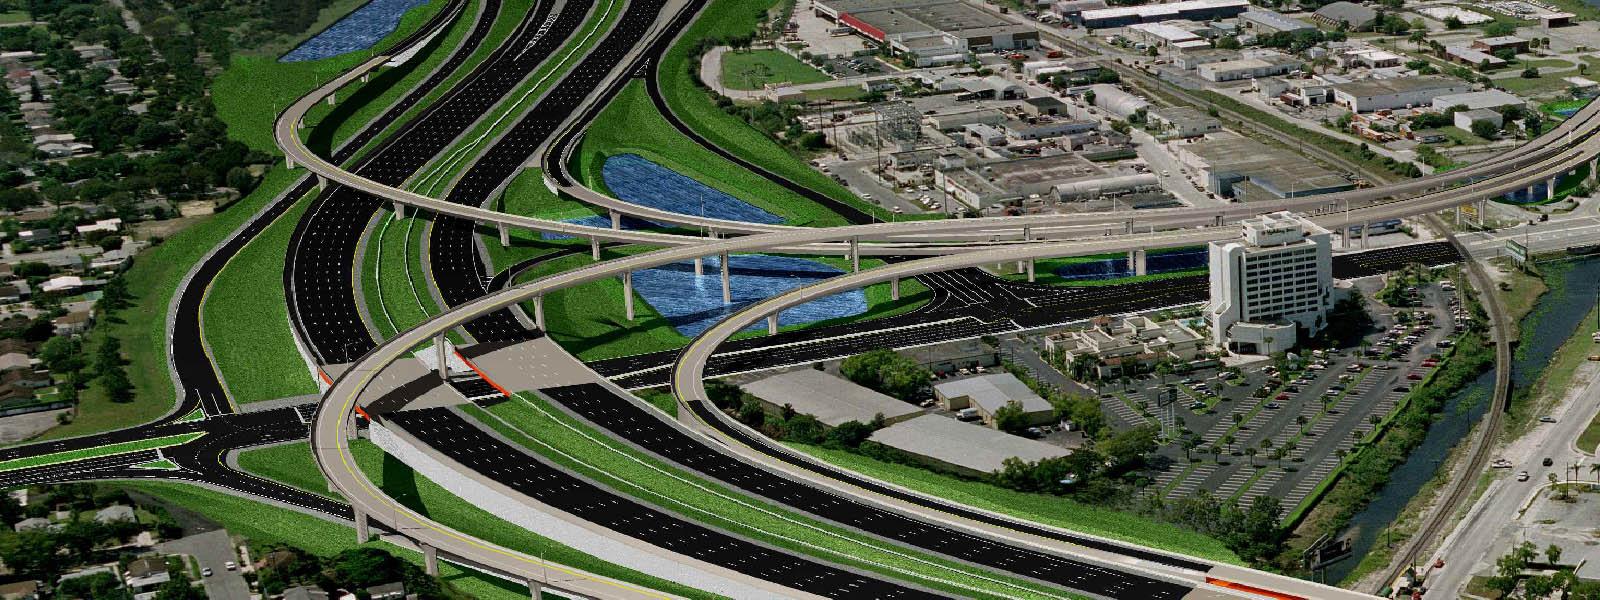 pb-freeway-aerial-view